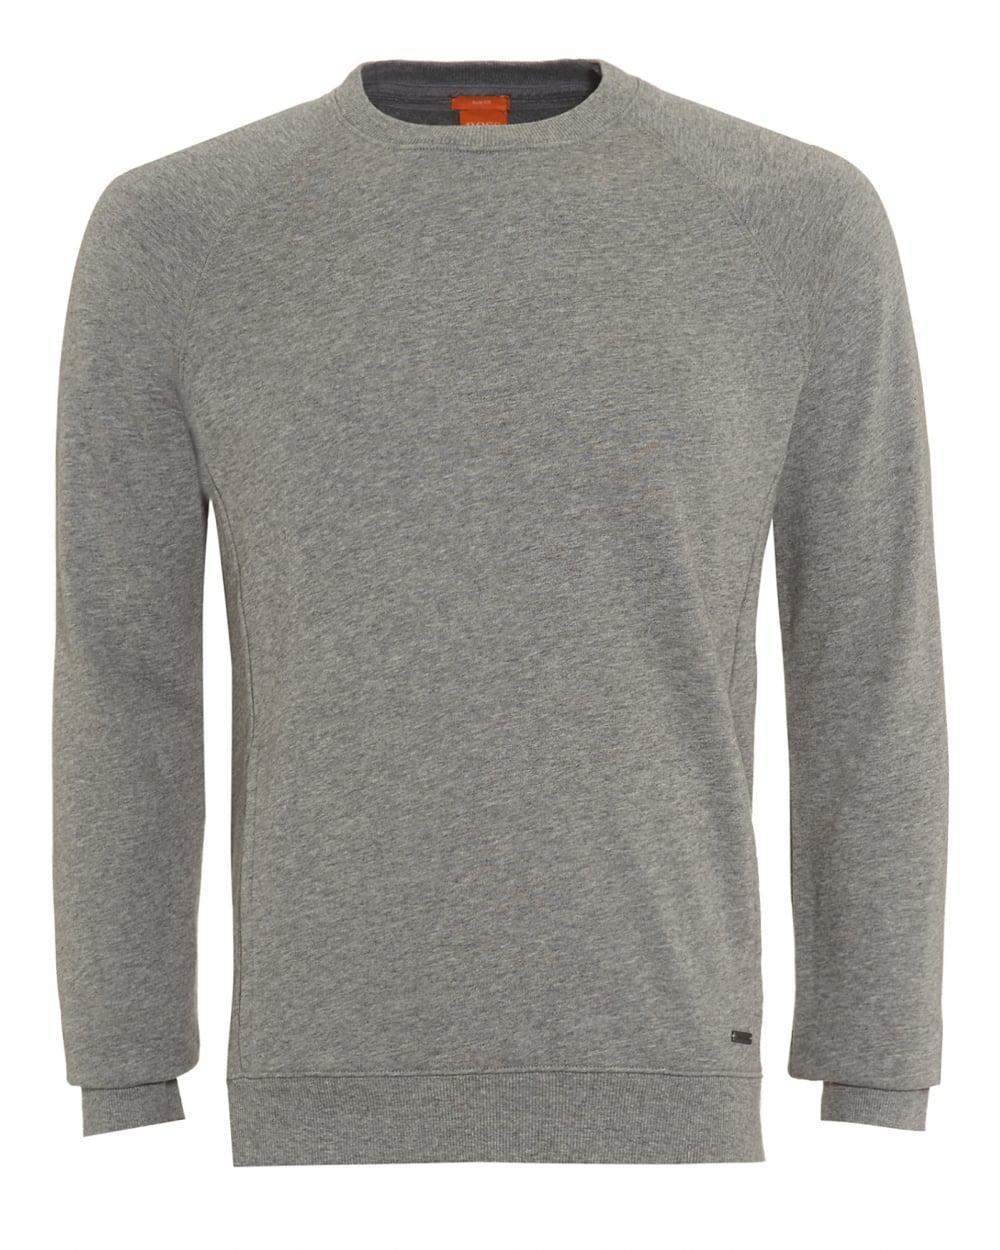 fb46758b2ed5 Lyst - BOSS Sweater